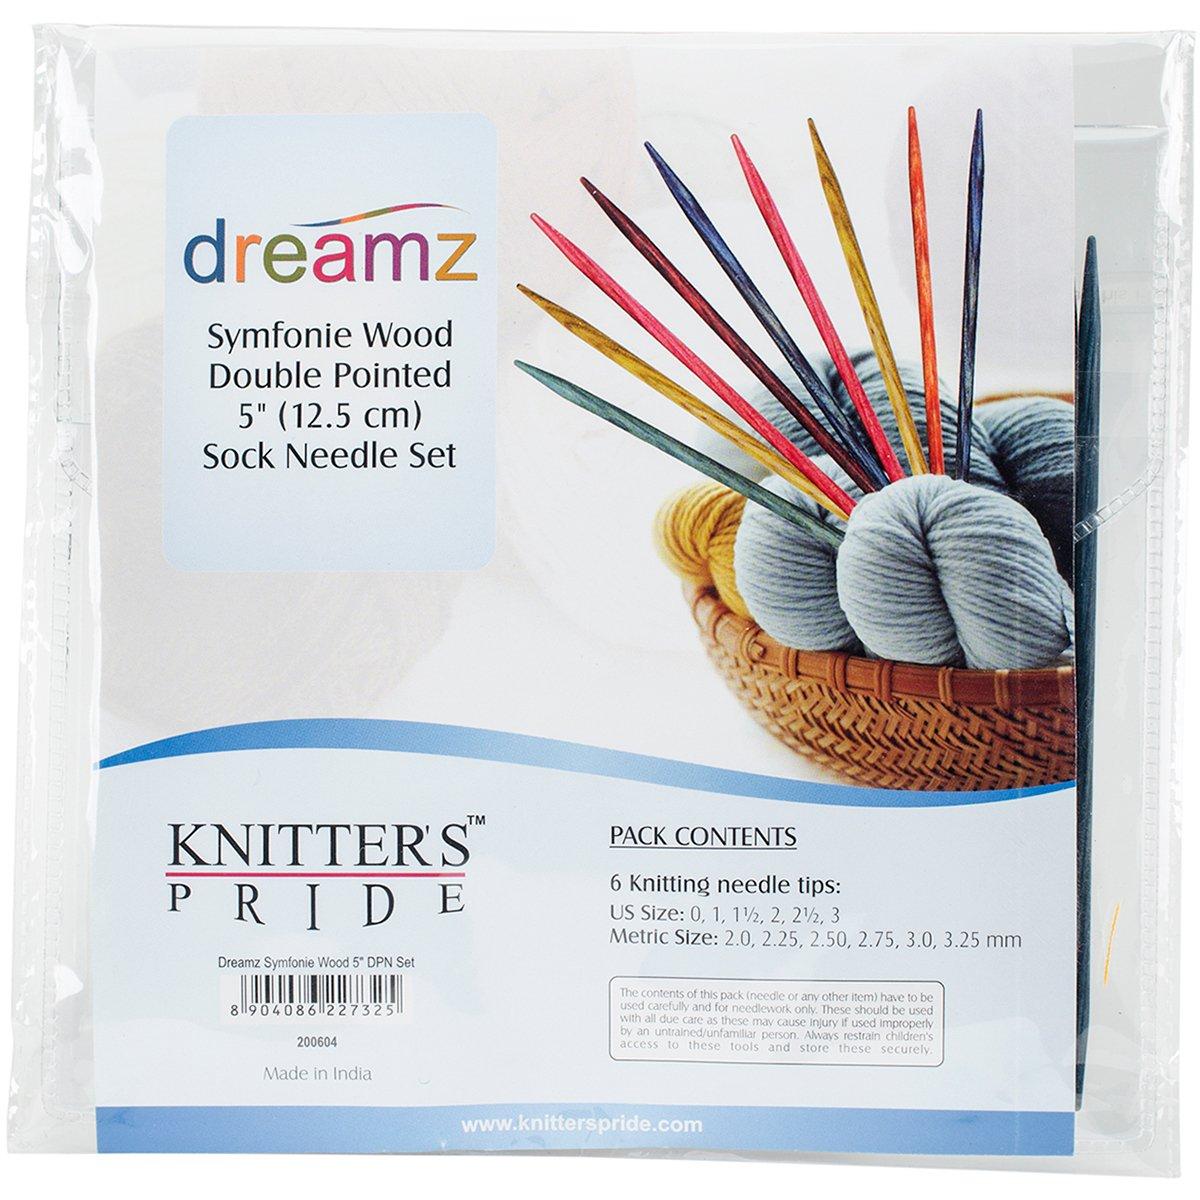 Knitter's Pride Dreamz Double Pointed Needle Socks Kit, 5''